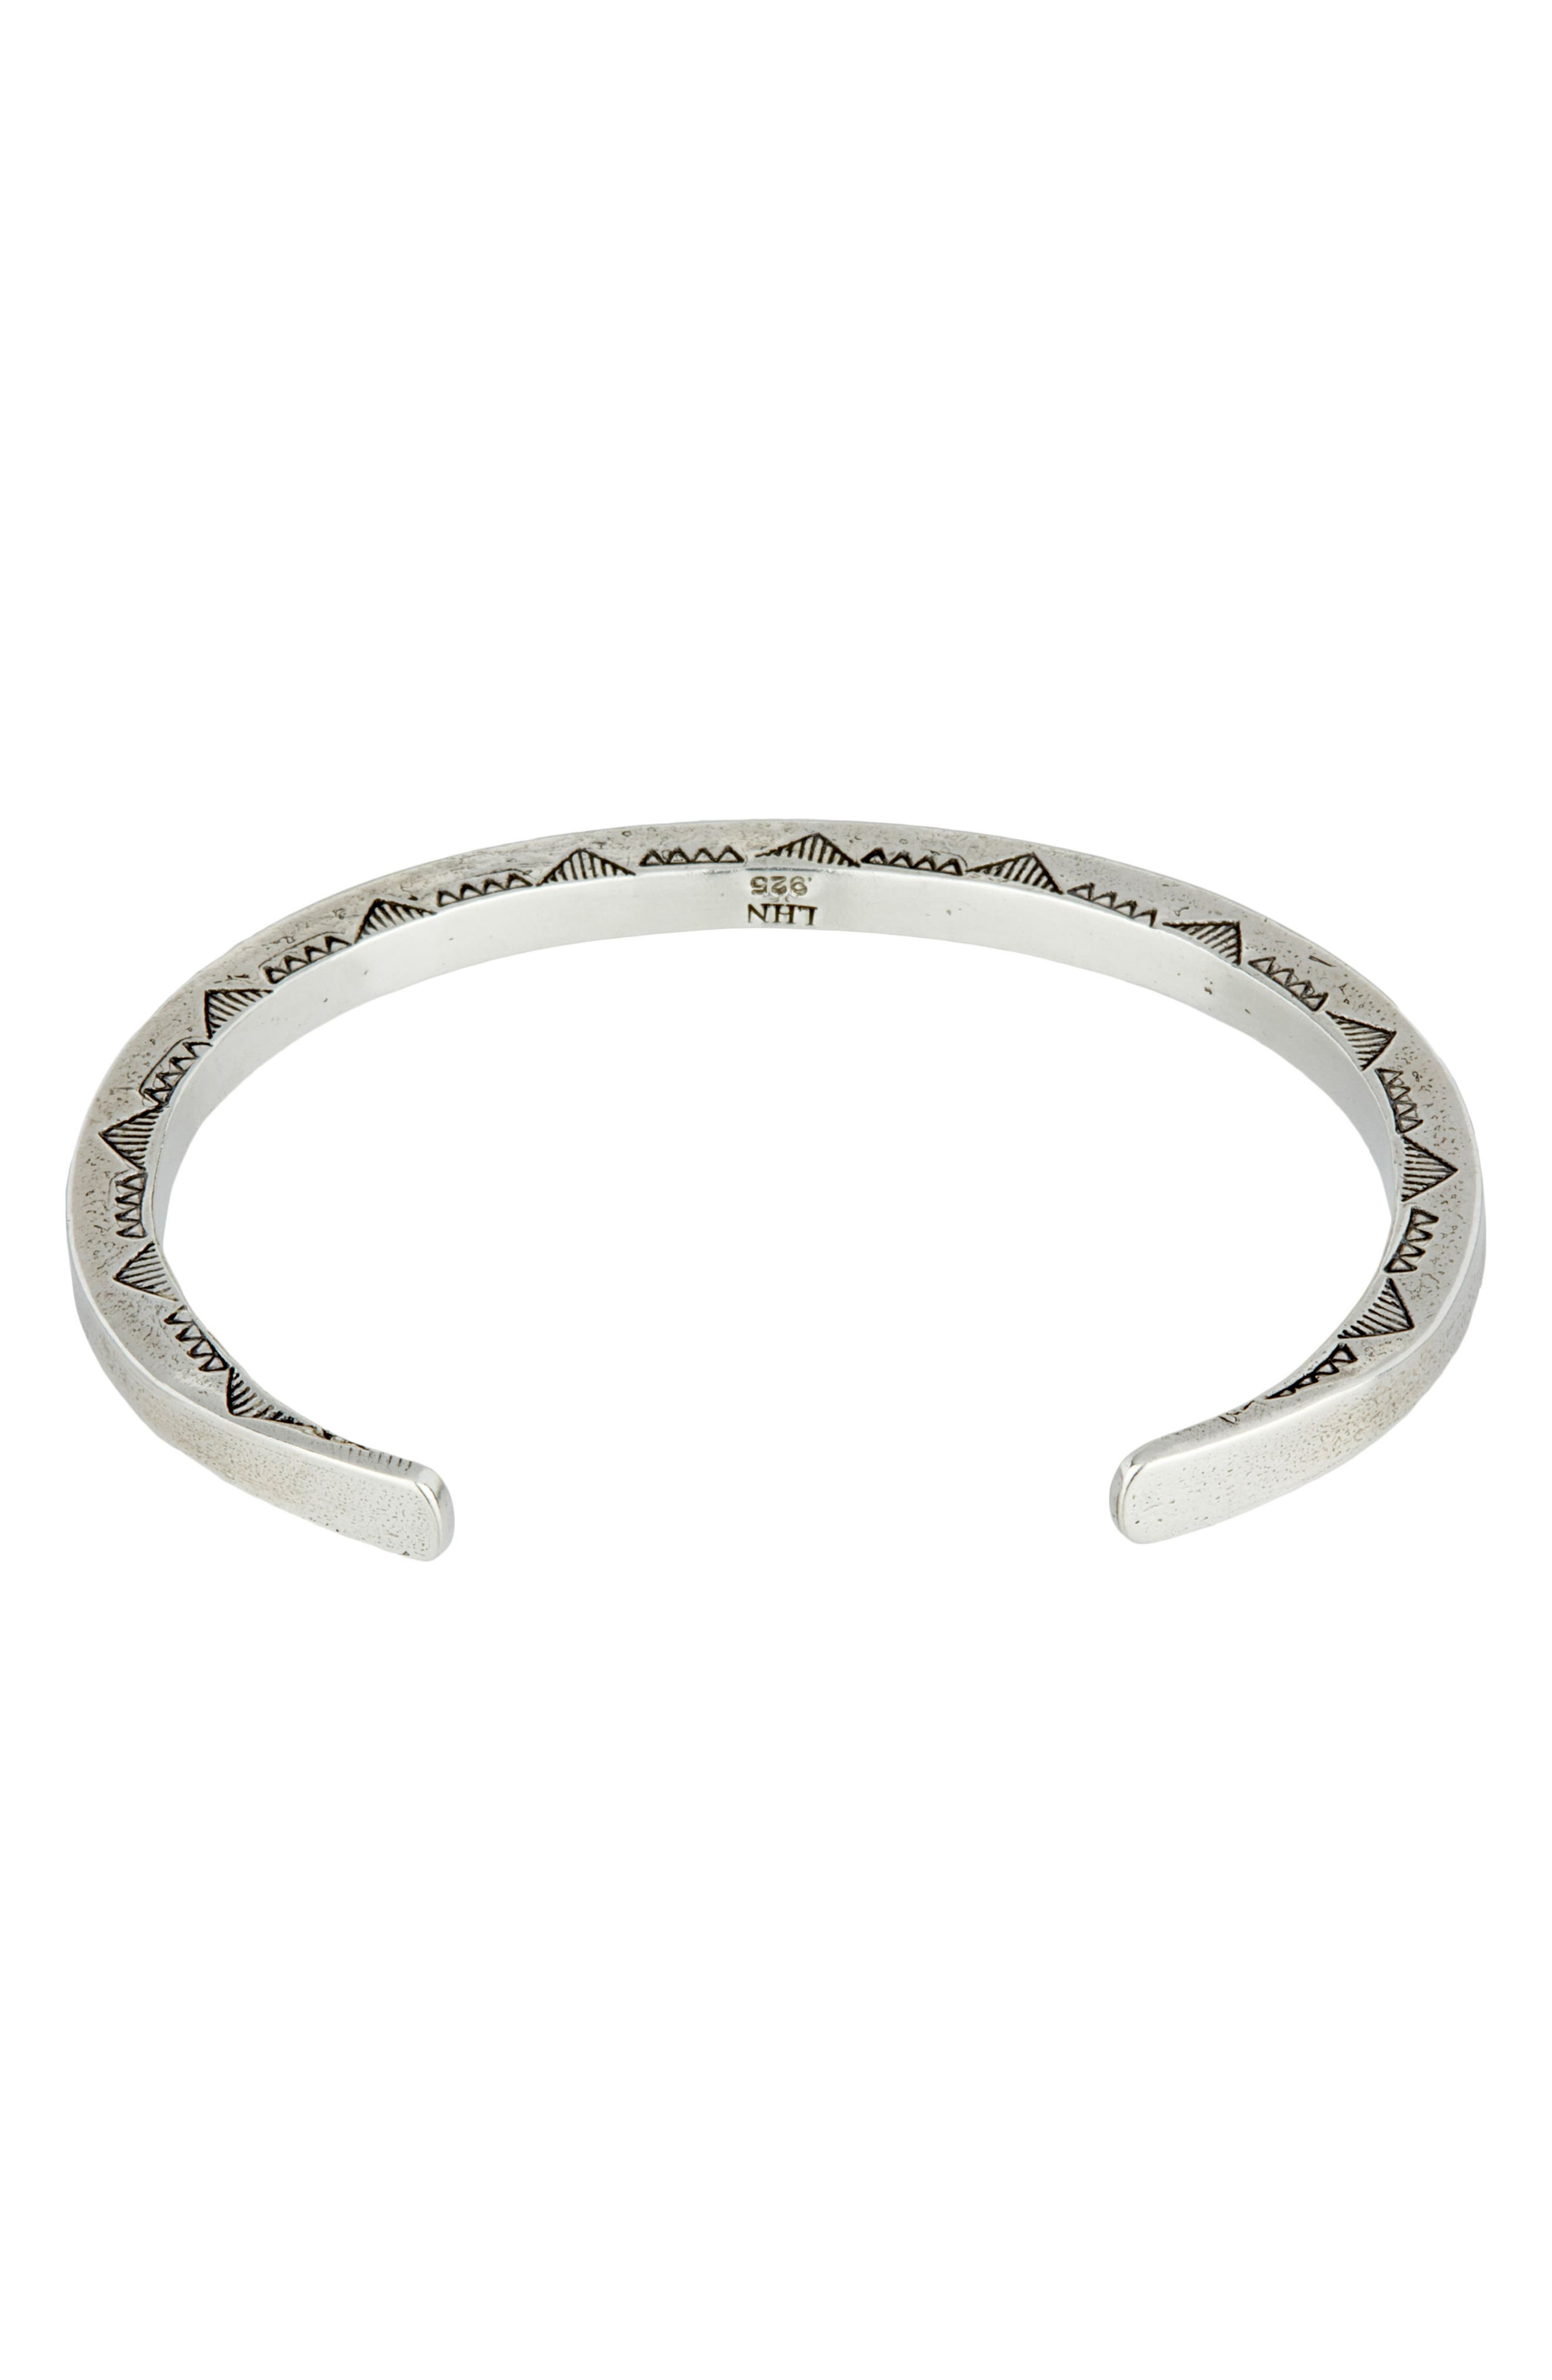 Alternate Image 2  - Lewis Henry Nicholas Sterling Silver Cuff Bracelet